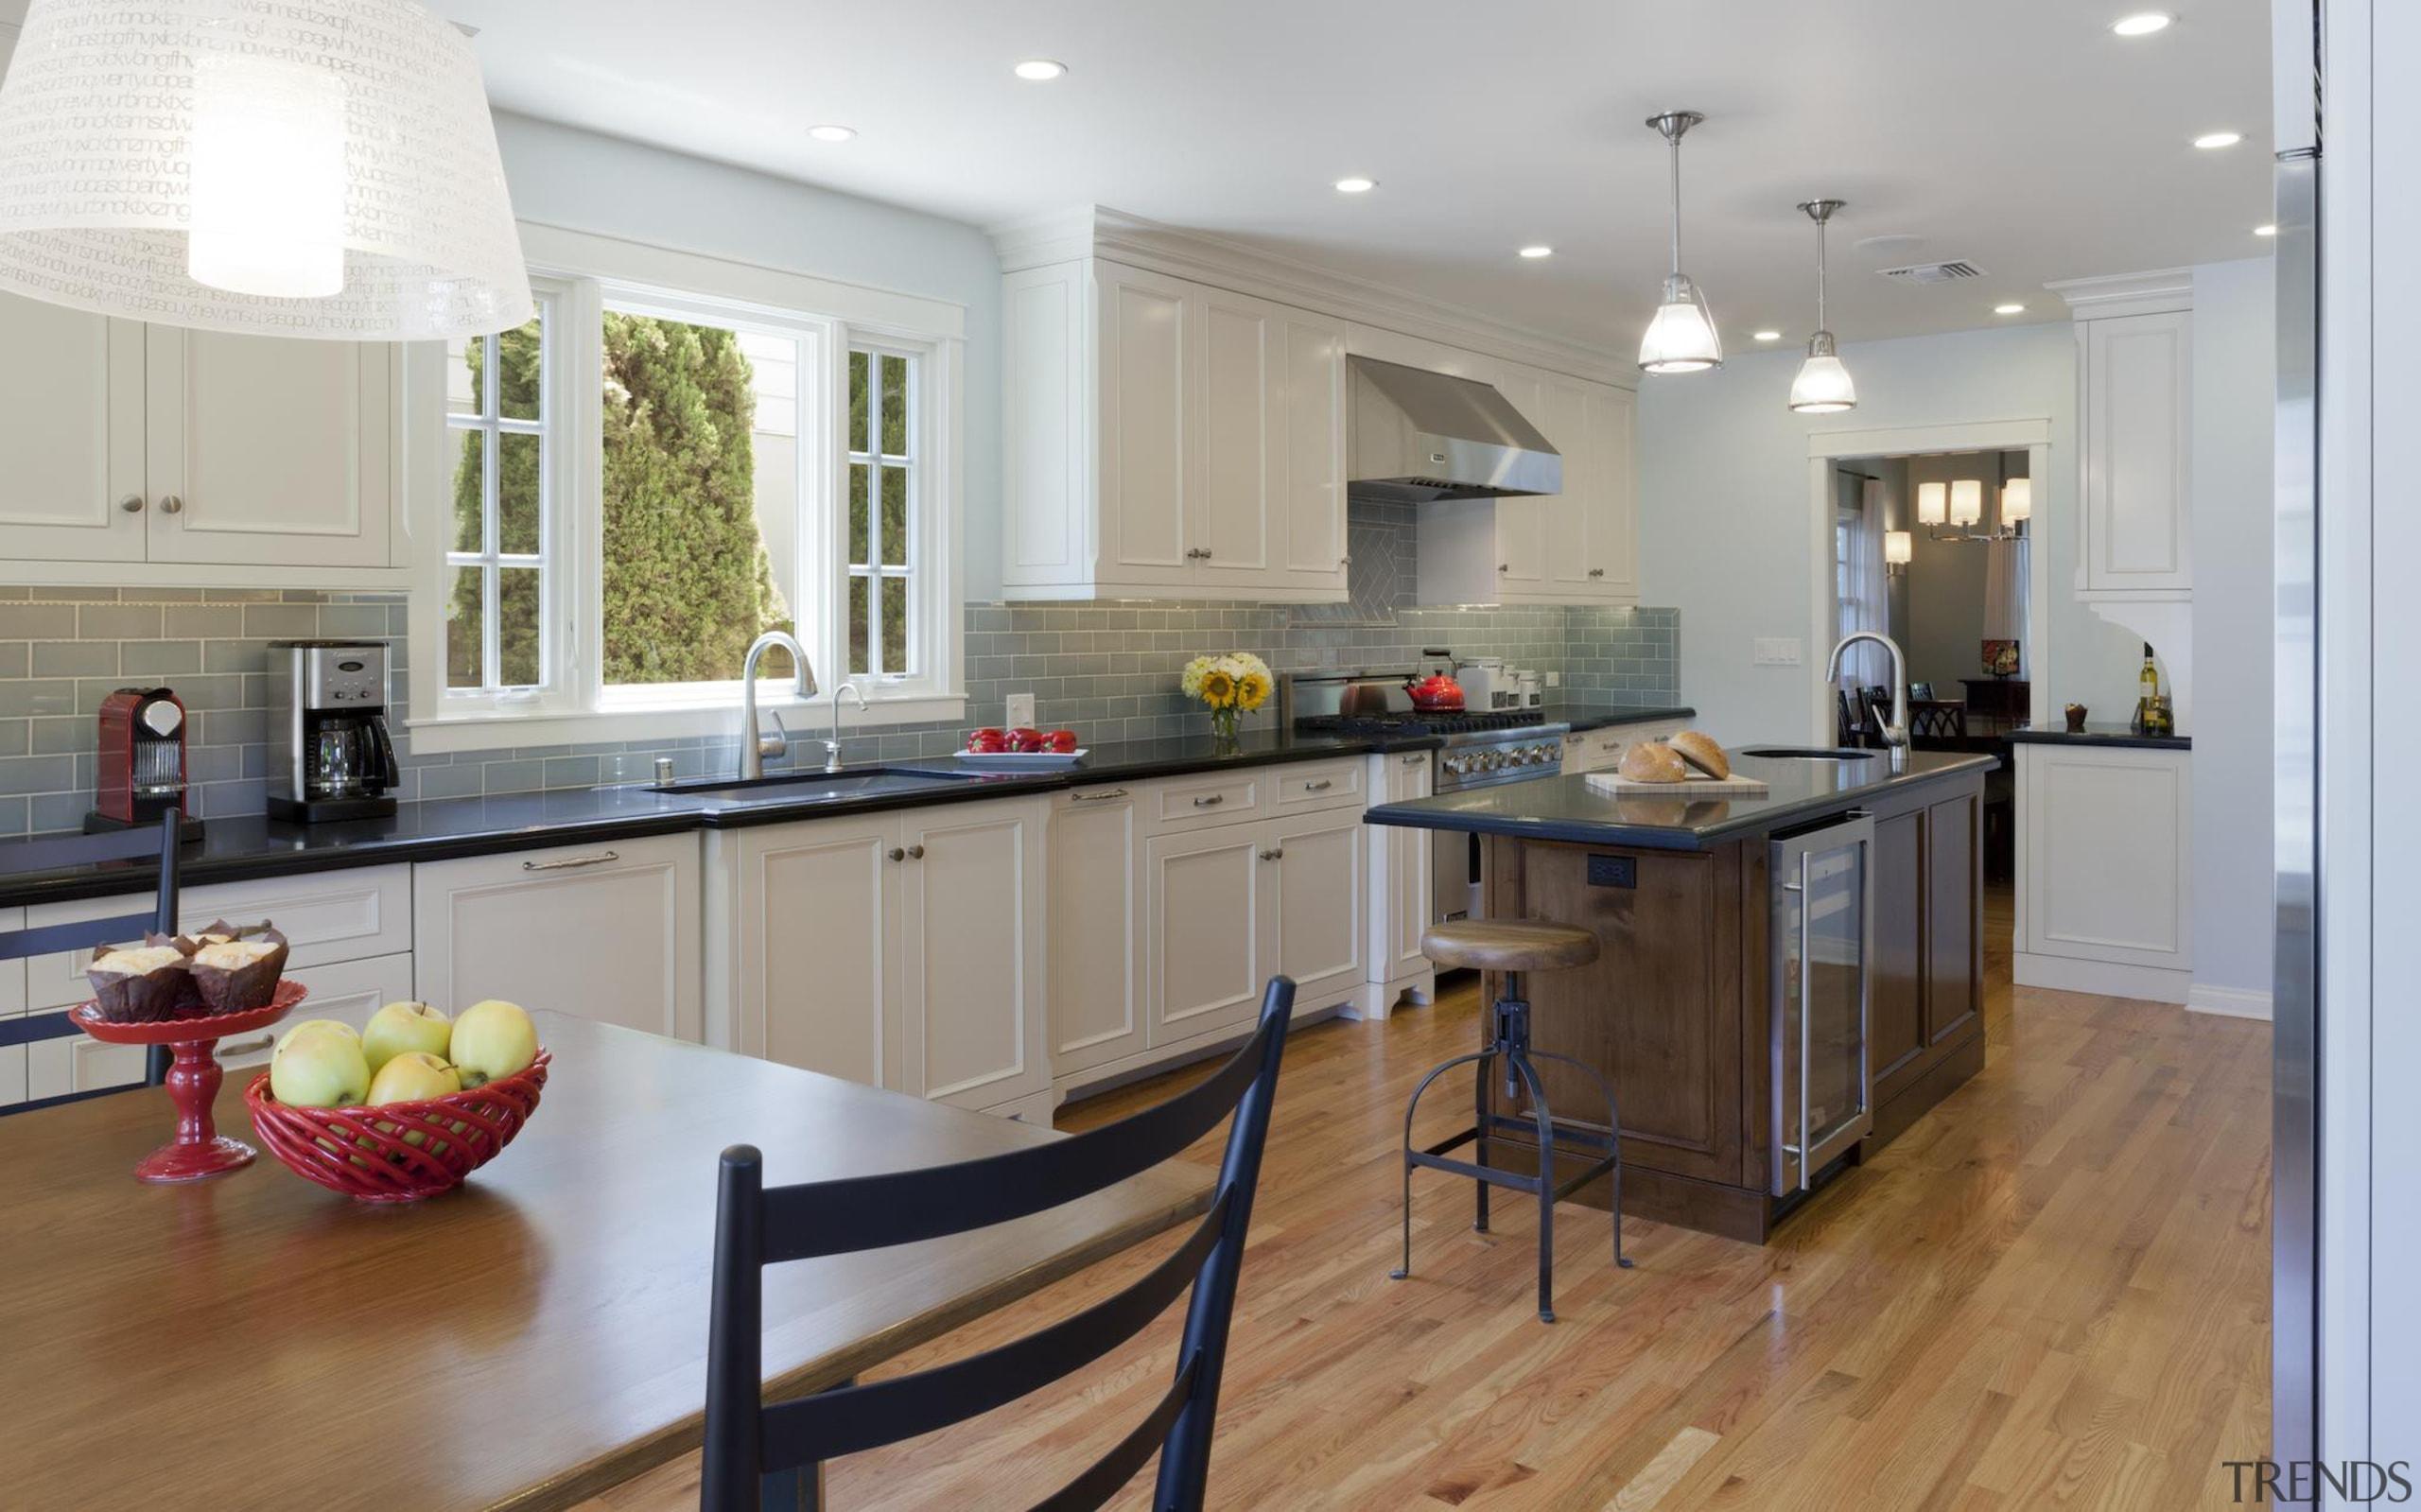 Transitional Kitchen - Transitional Kitchen - cabinetry   cabinetry, countertop, cuisine classique, floor, flooring, hardwood, interior design, kitchen, laminate flooring, real estate, room, wood flooring, gray